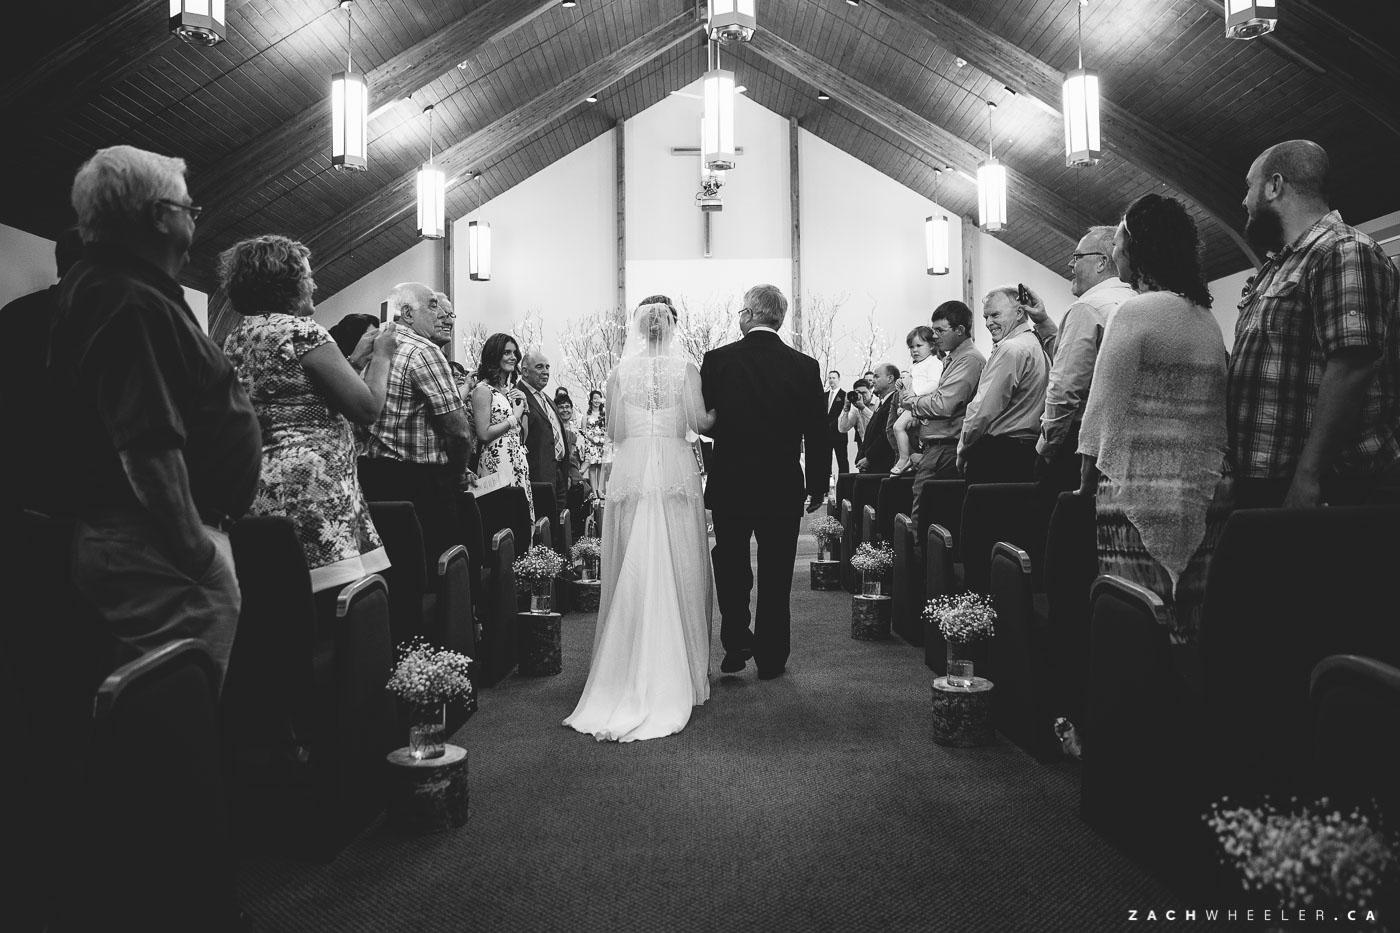 Sarah-Grant-Lesters-Fram-Wedding-30